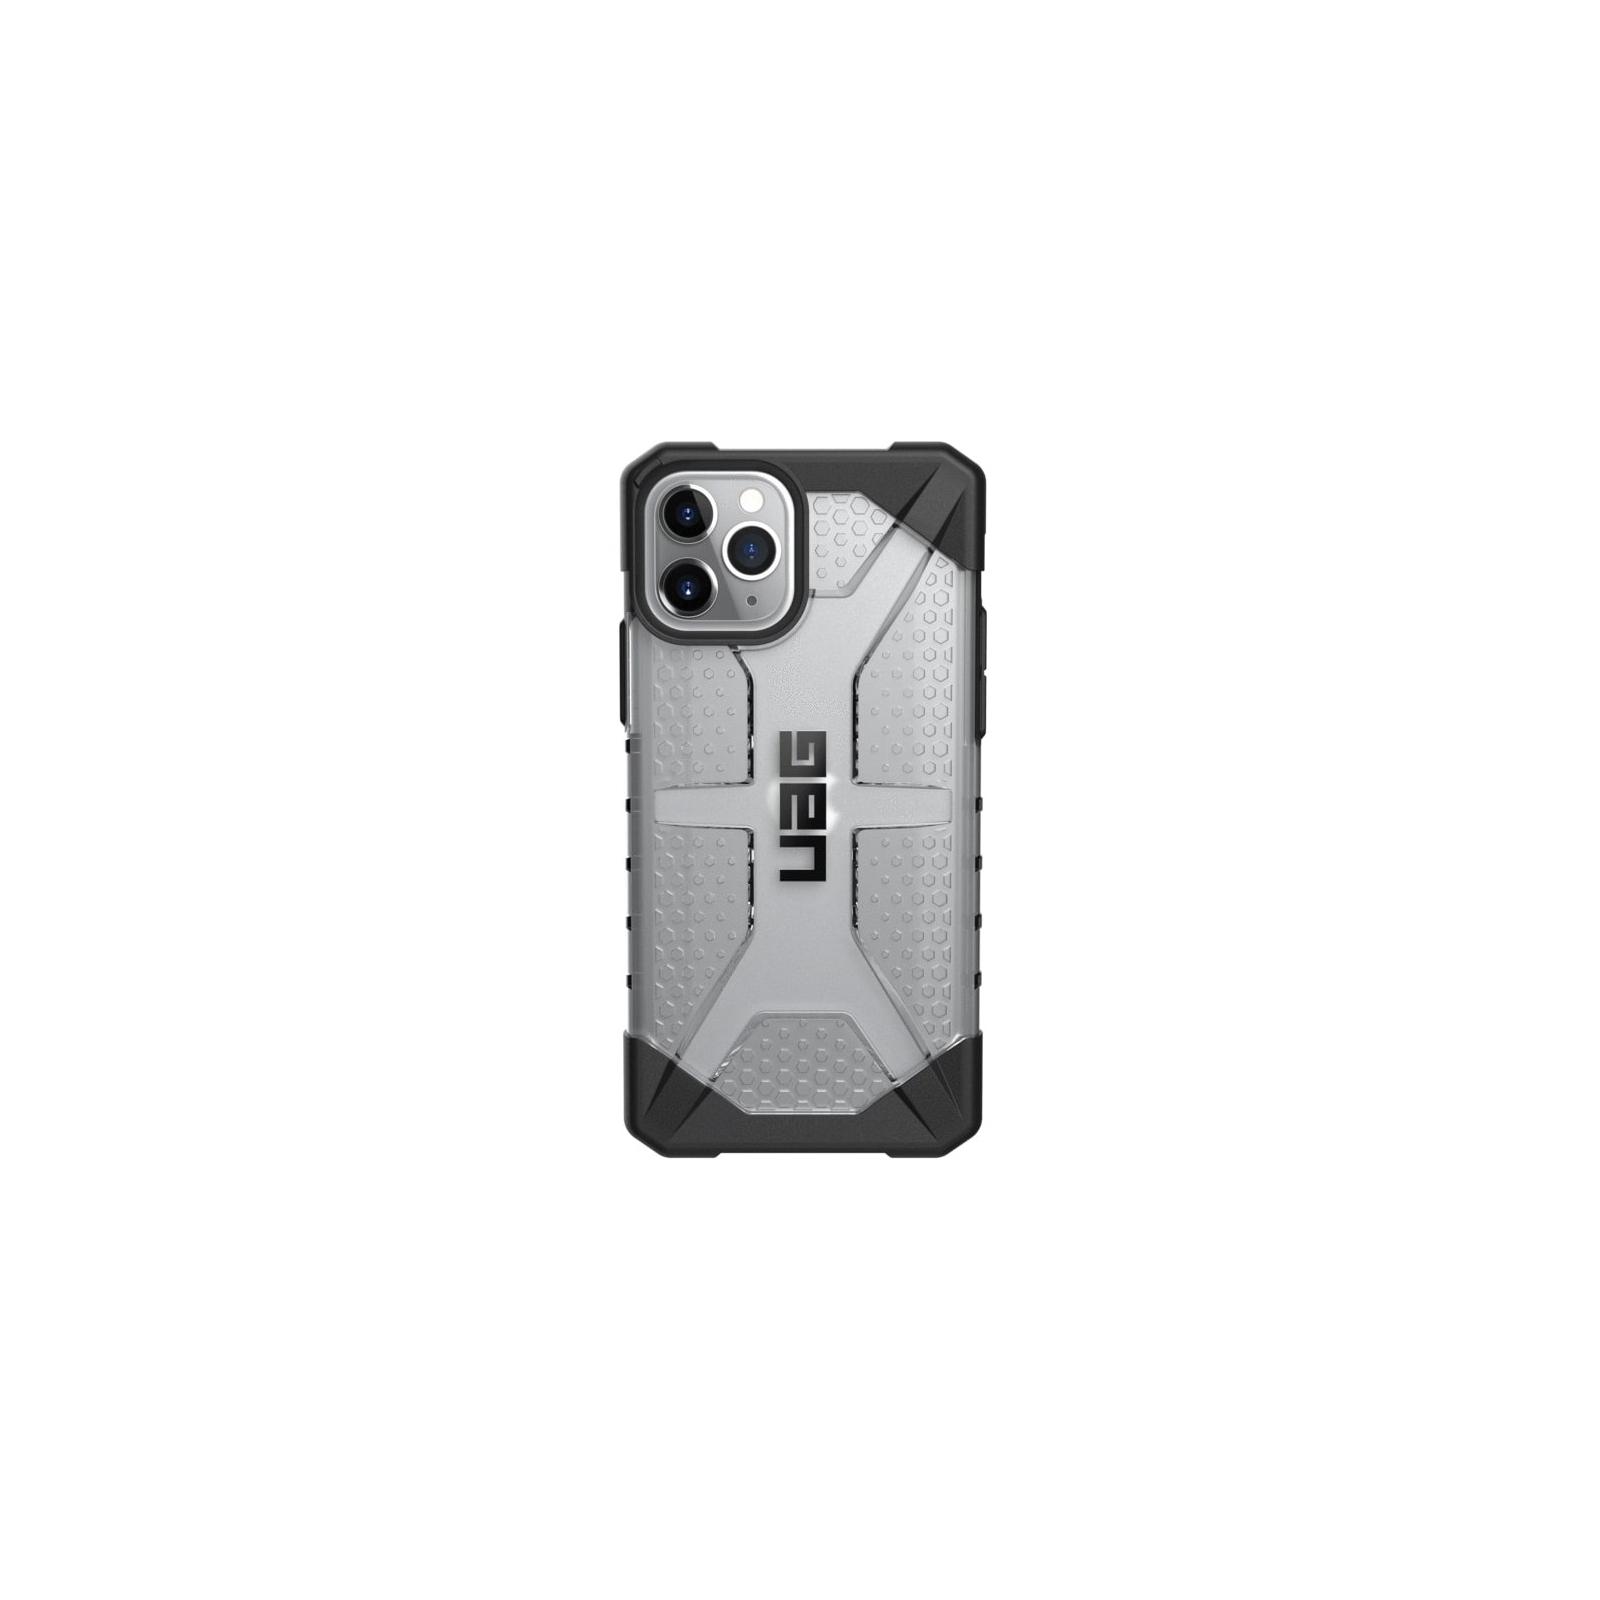 Чехол для моб. телефона Uag iPhone 11 Pro Plasma, Ice (111703114343)